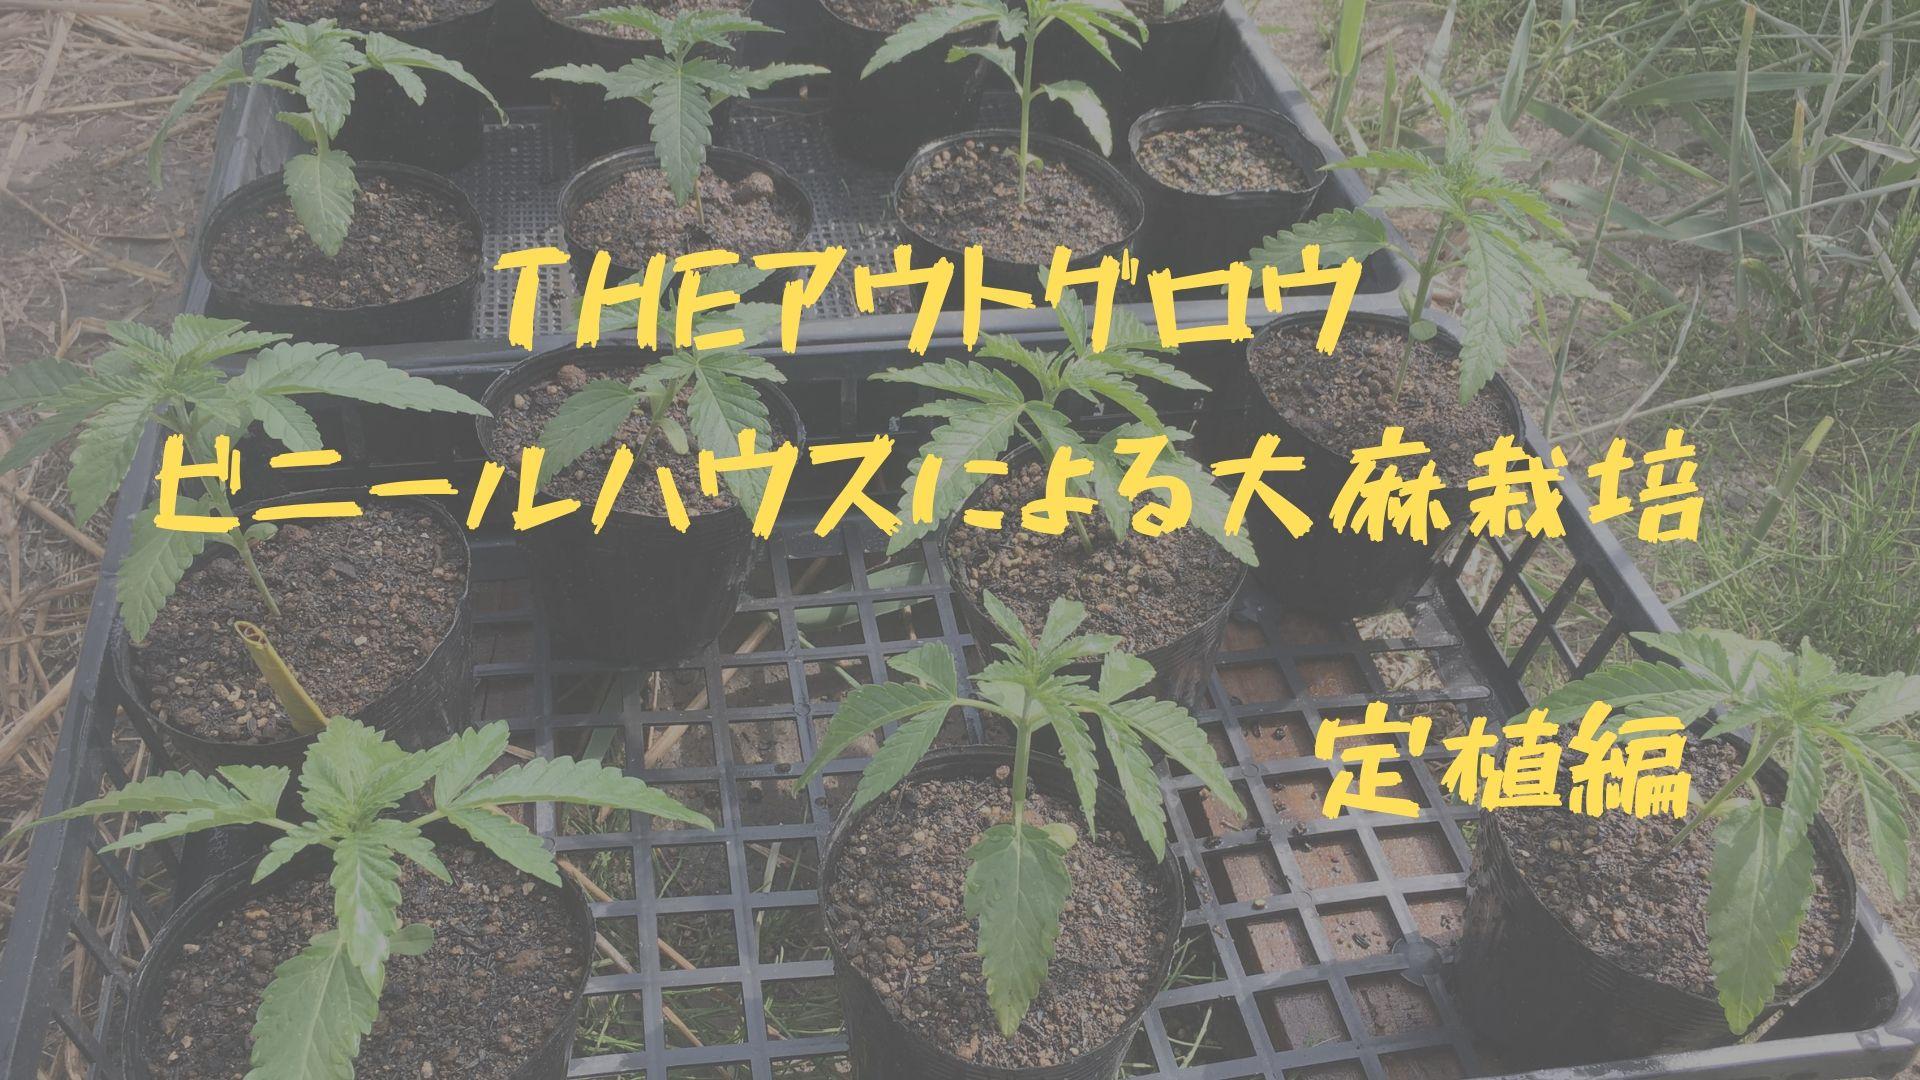 THEアウトグロウ 定植